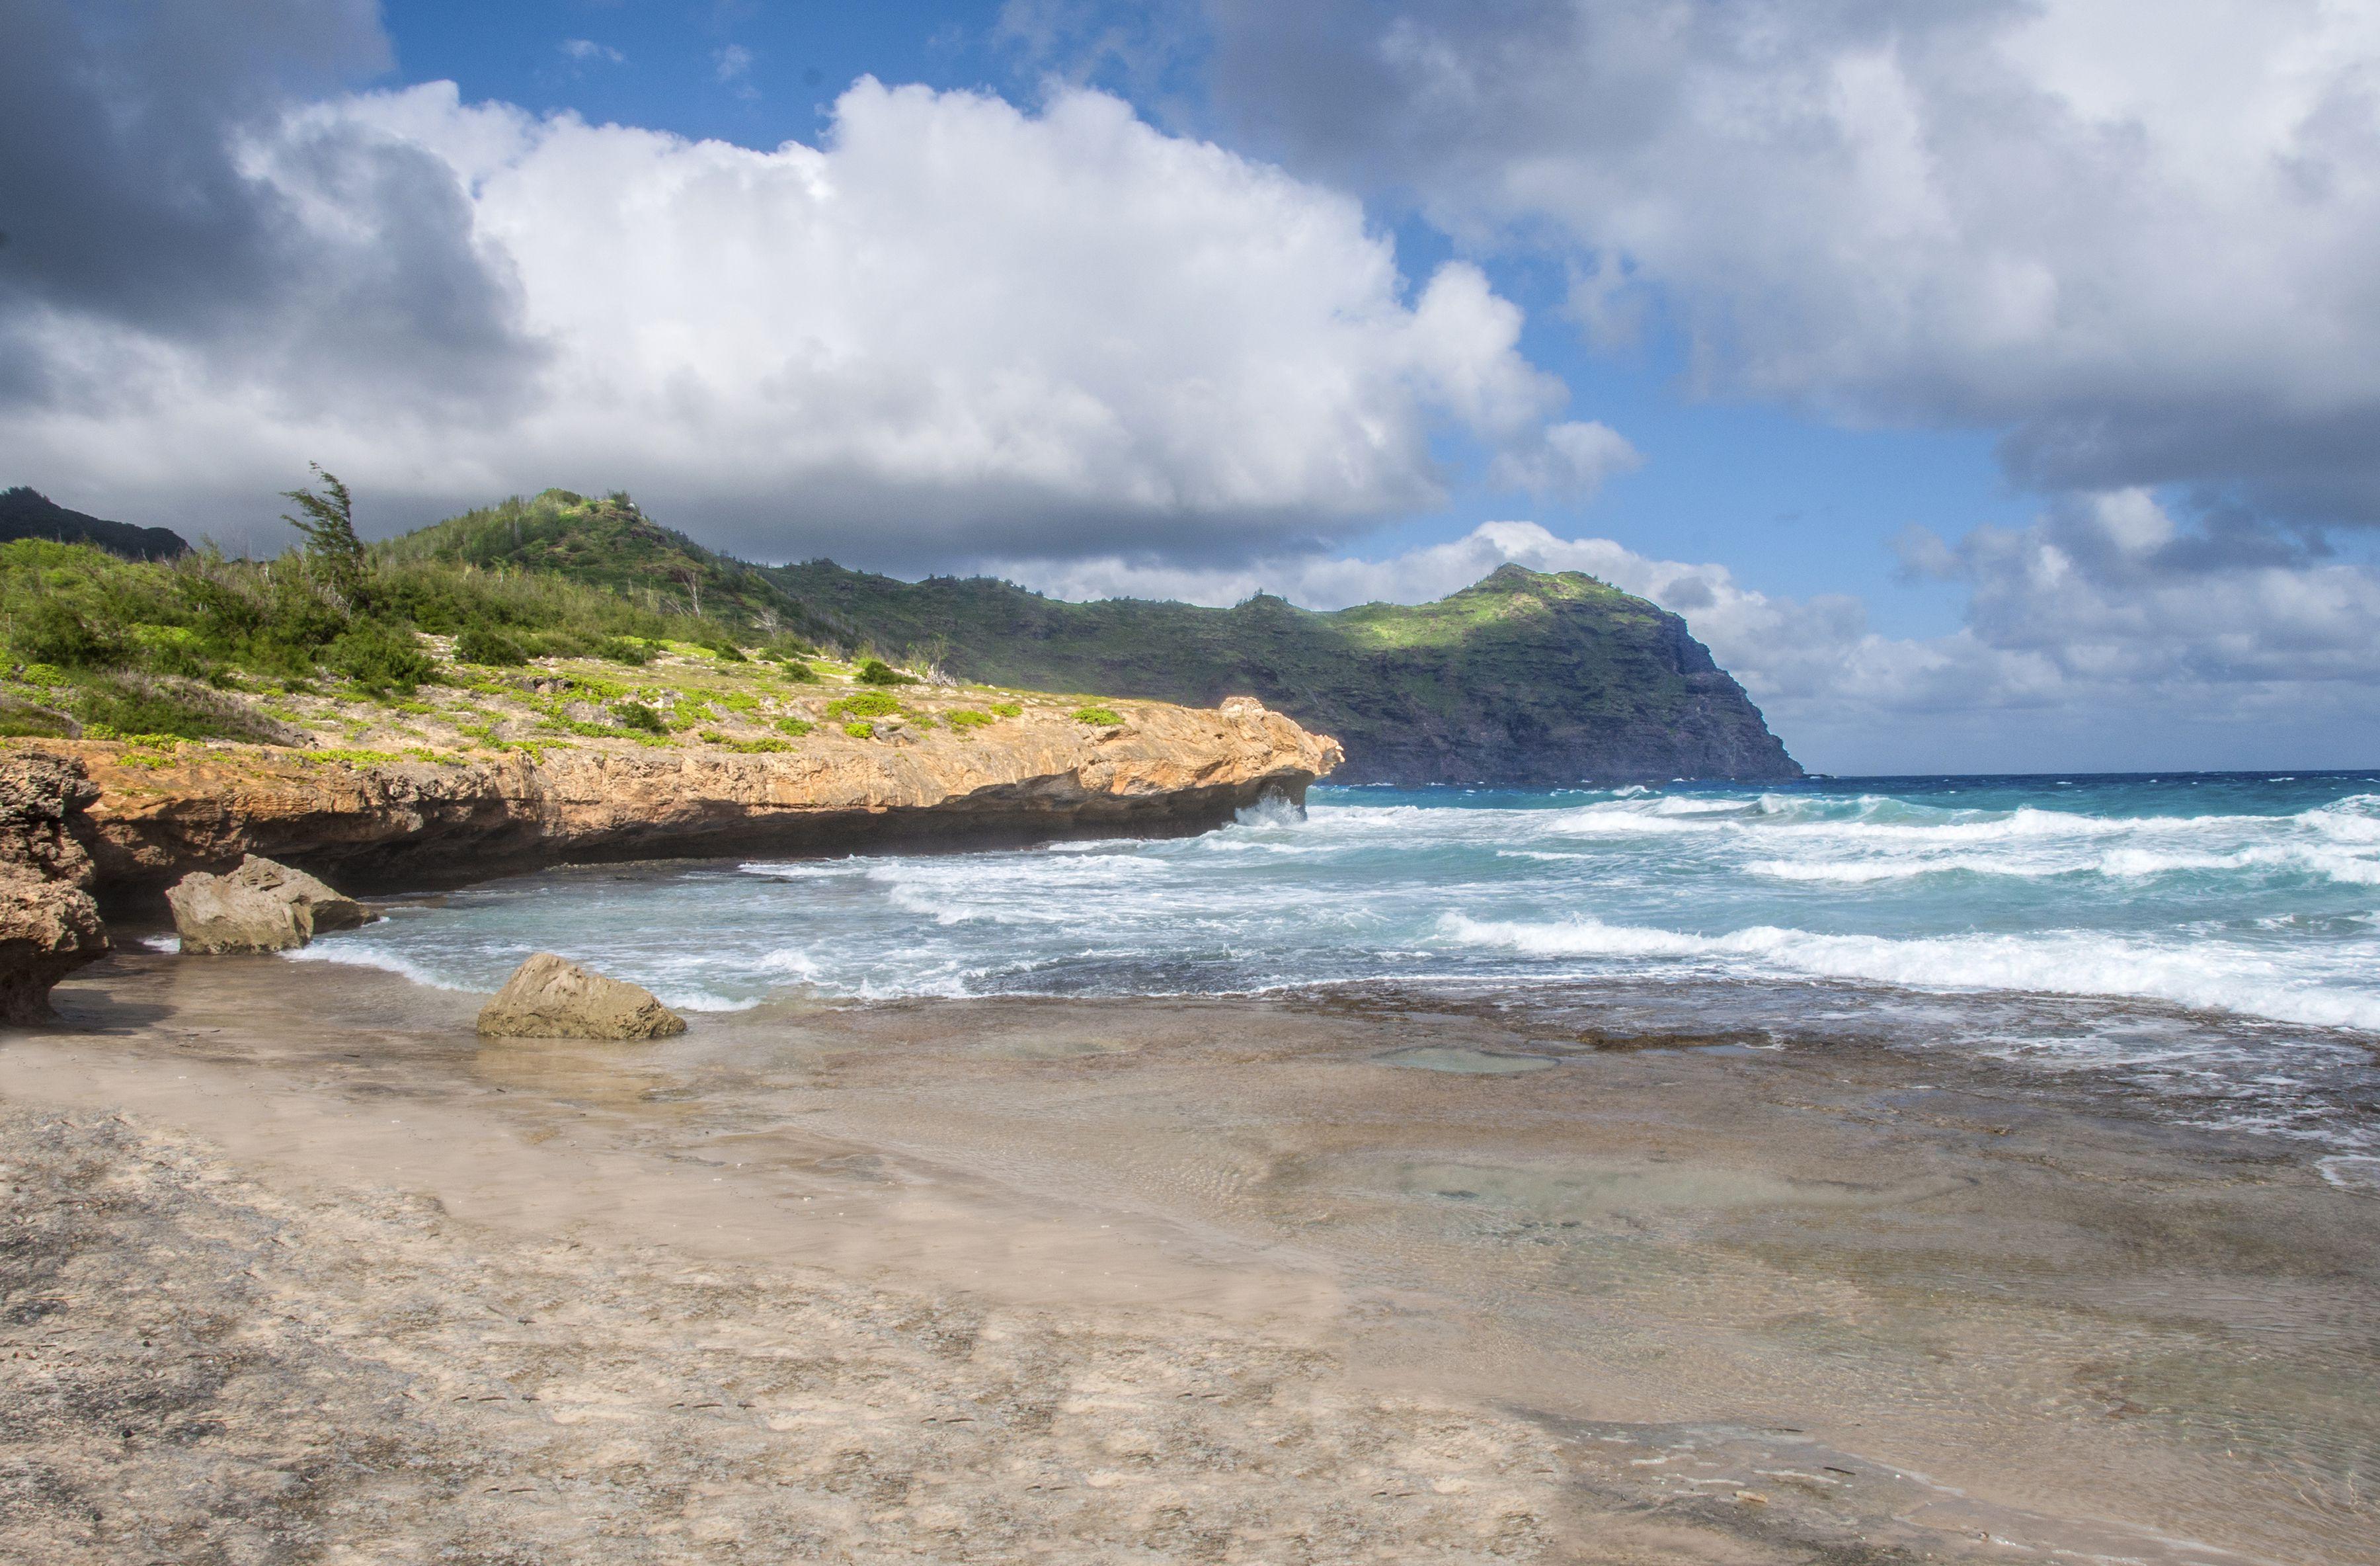 Māhāʻulepū Beach is a beach on the southeast coast of the Hawaiian island of Kauai